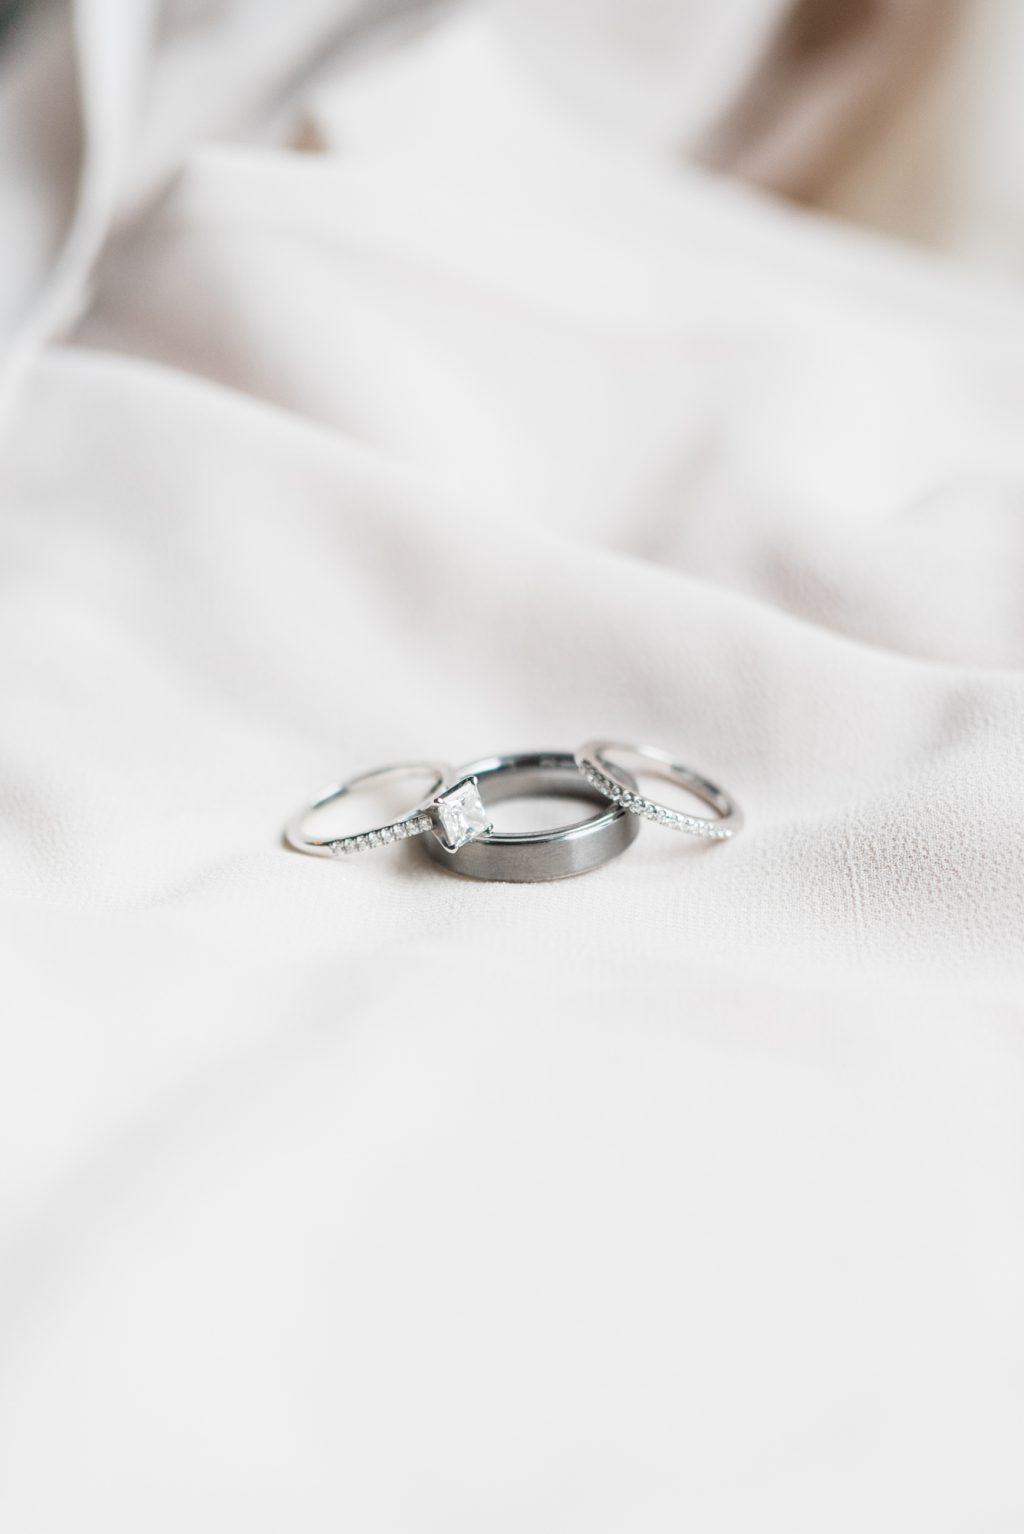 haleyrichterphoto-front-and-palmer-spring-wedding-rodin-museum-loews-hotel-philadelphia-013